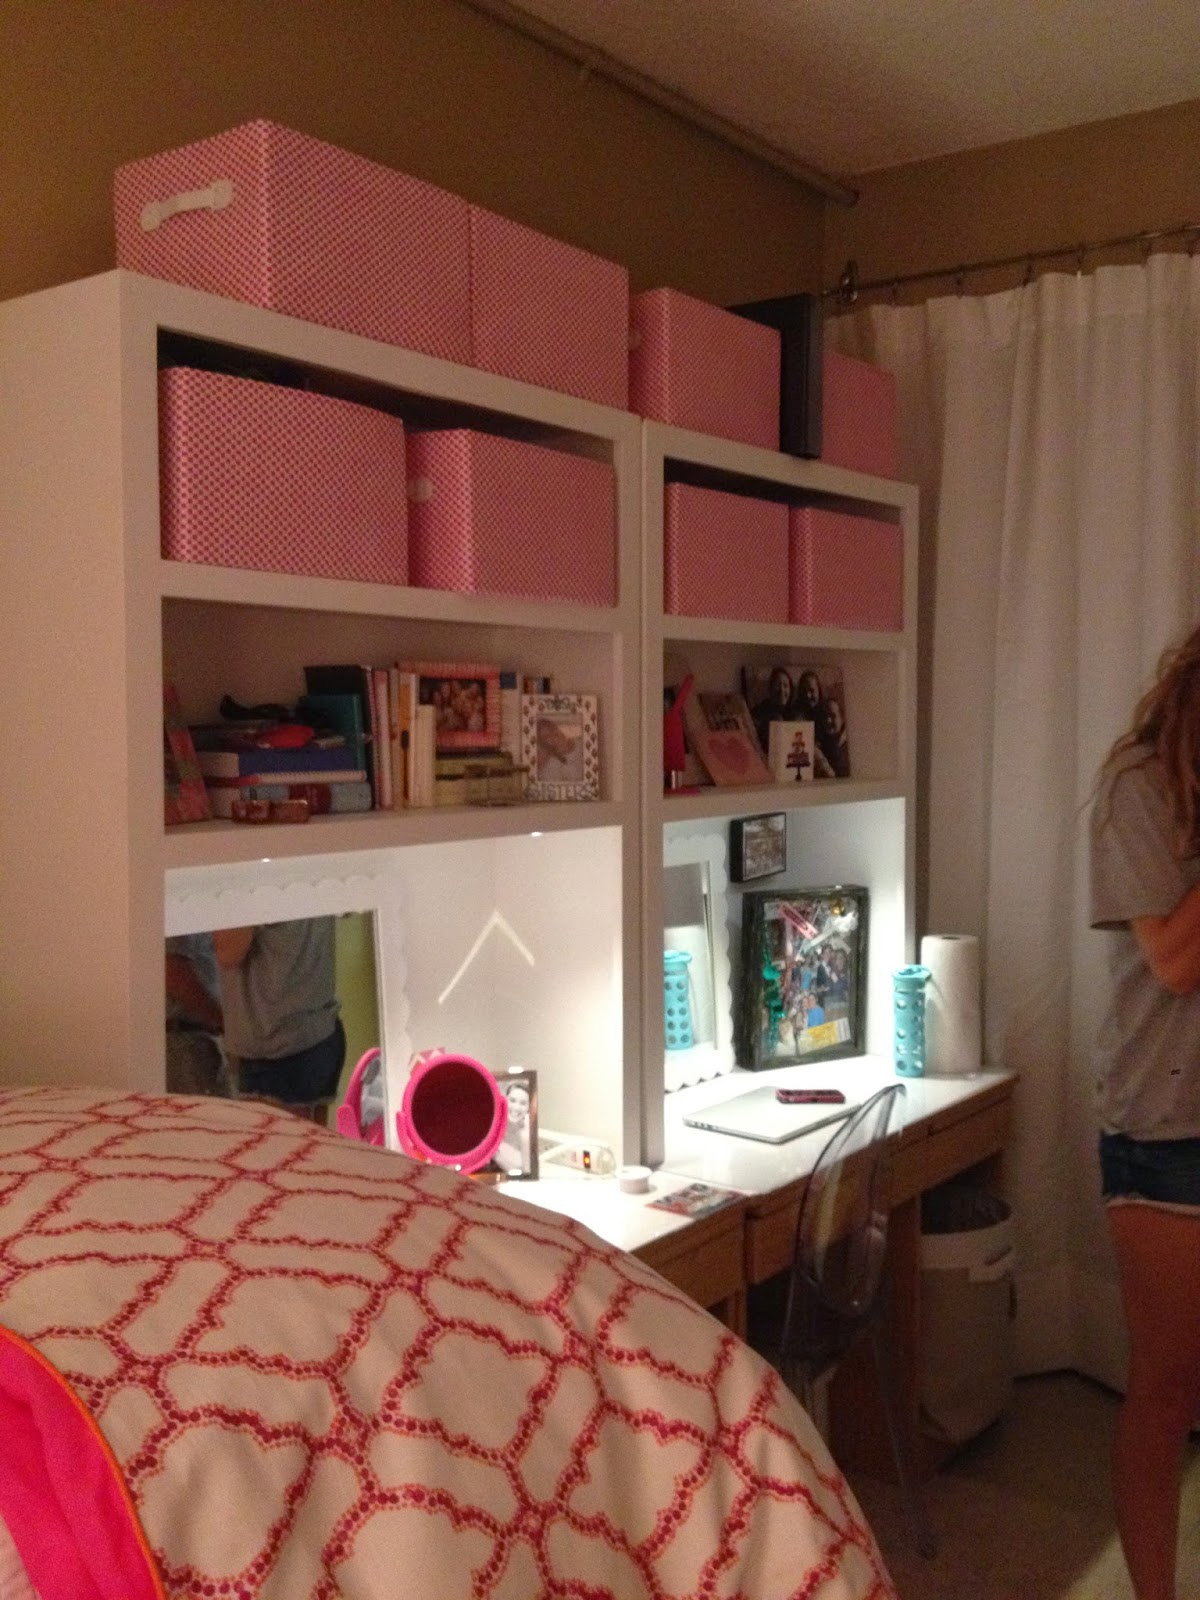 Dorm Room Furniture: Brookwood Lane: Dorm Rooms